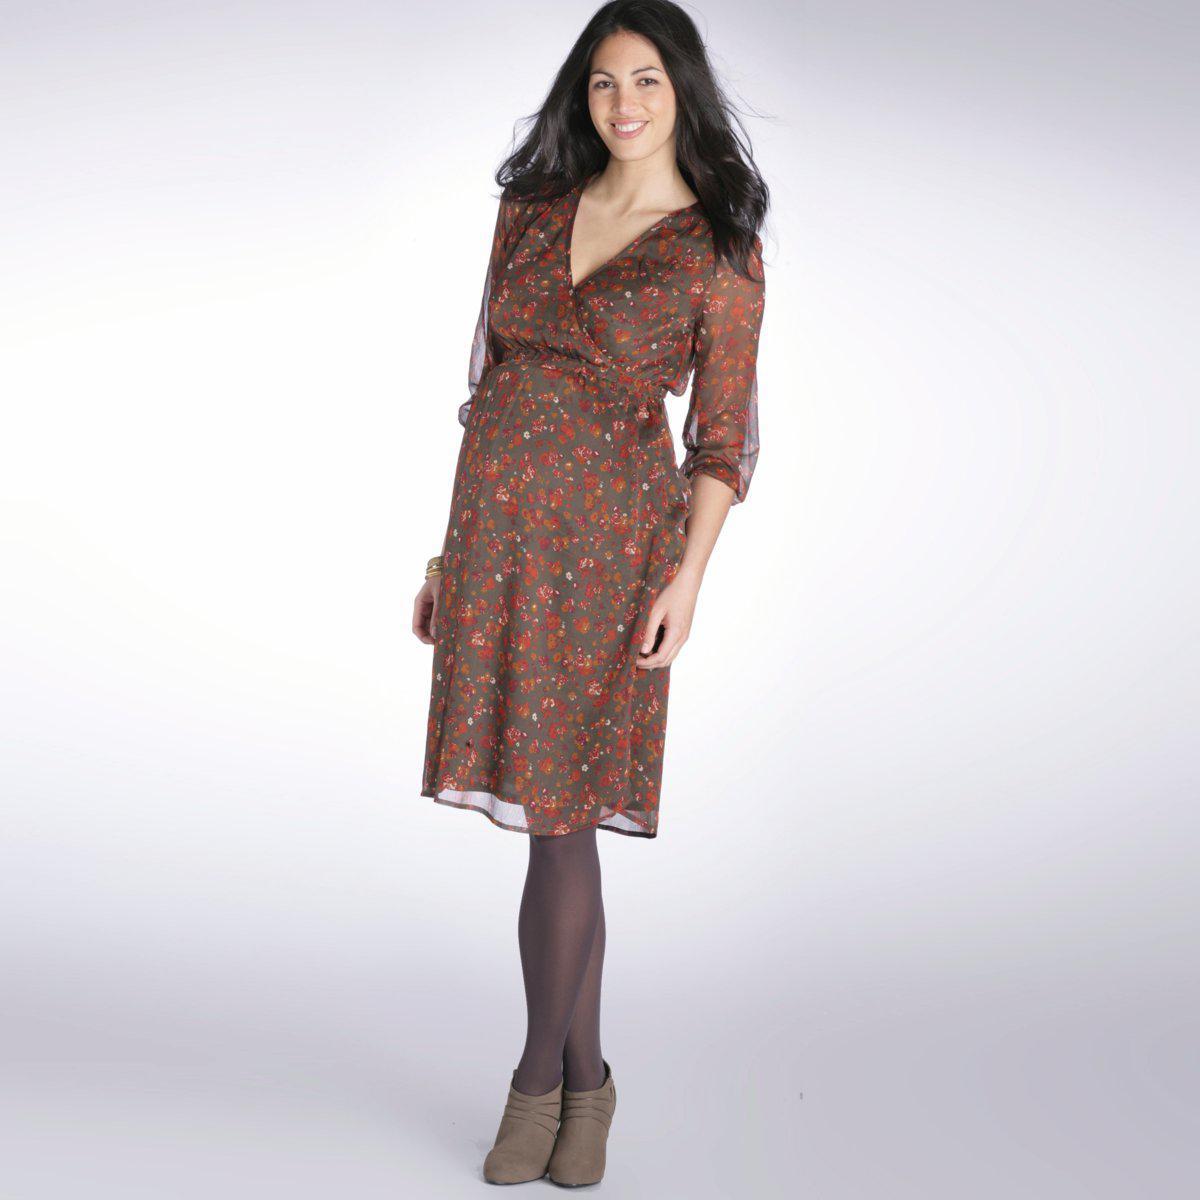 bradyna foremata 272 - Βραδυνα Φορεματα LaRedoute Χειμώνας 2012 Κωδ. 324205651